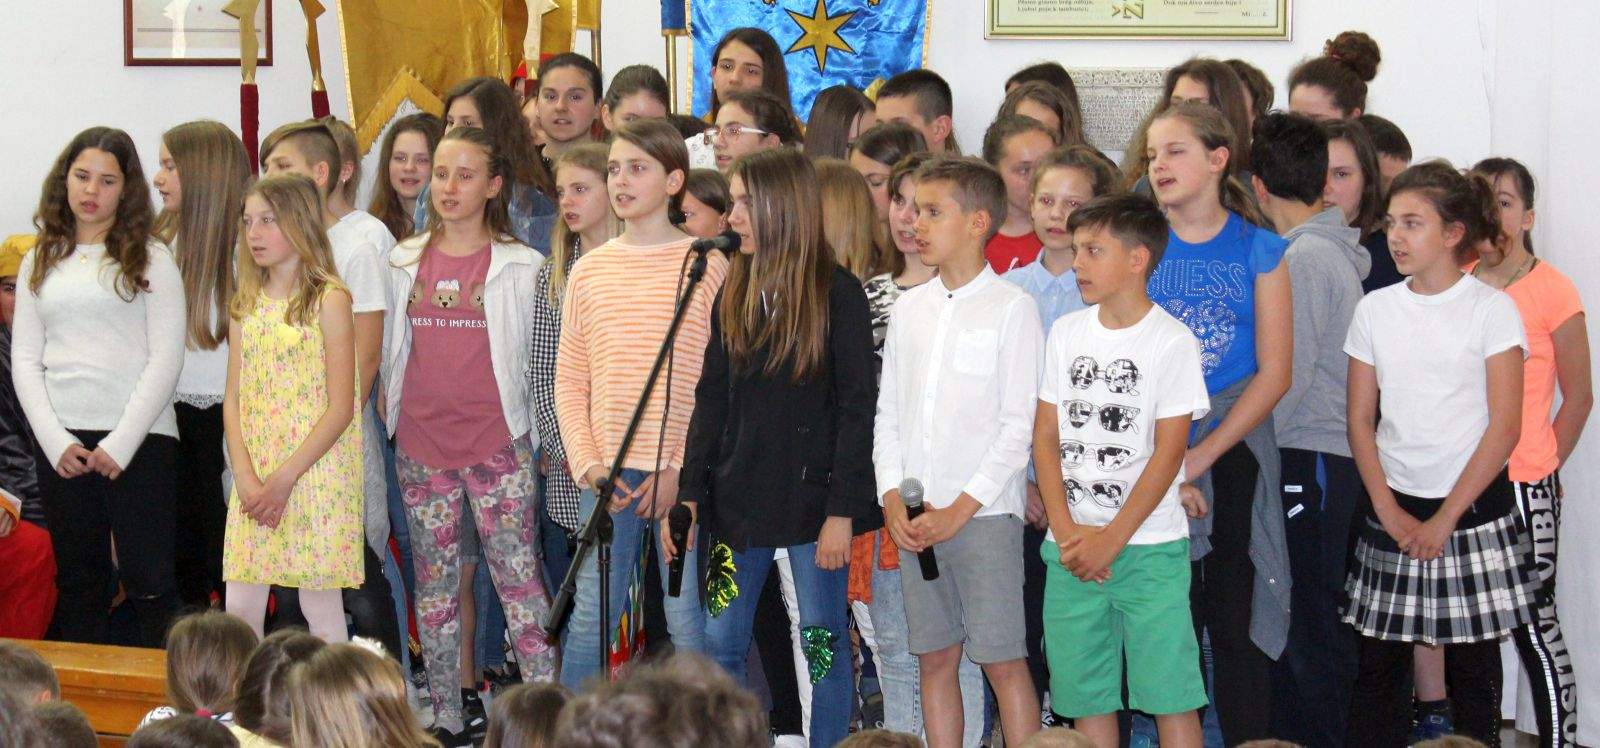 Obilježen Dan osnovne škole Malinska – Dubašnica